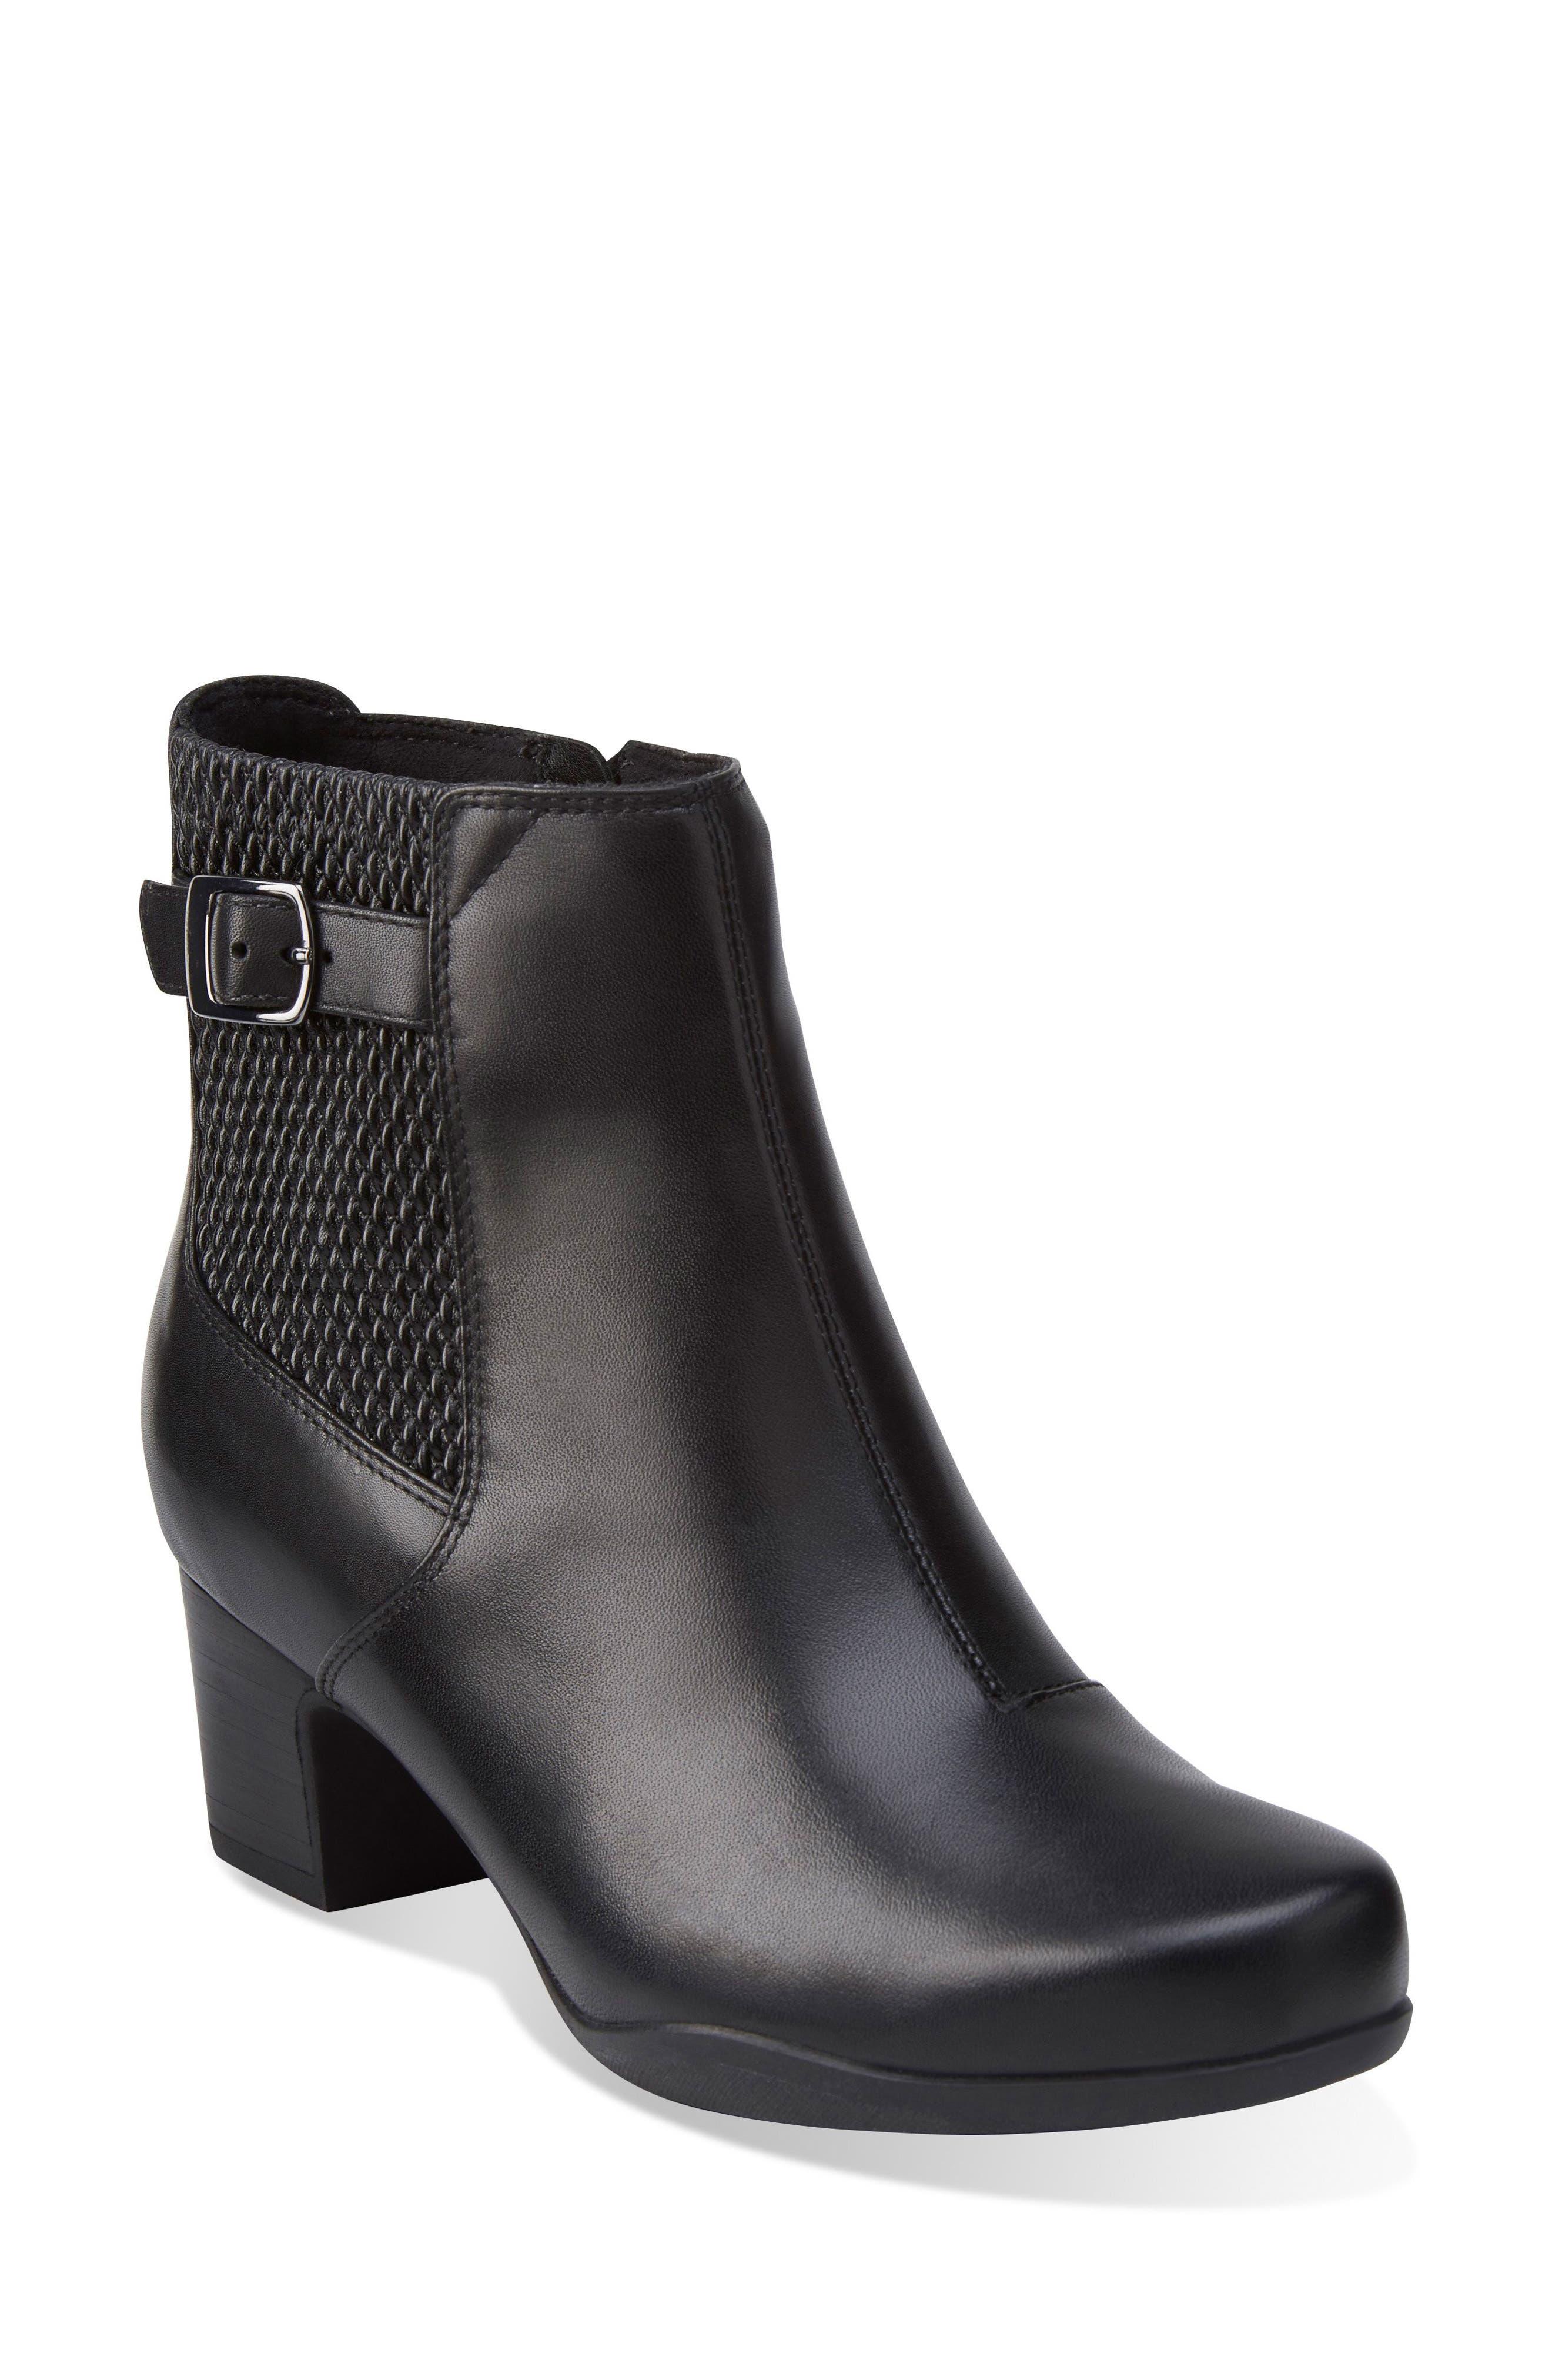 Main Image - Clarks® Rosalyn Lara Waterproof Boot (Women)